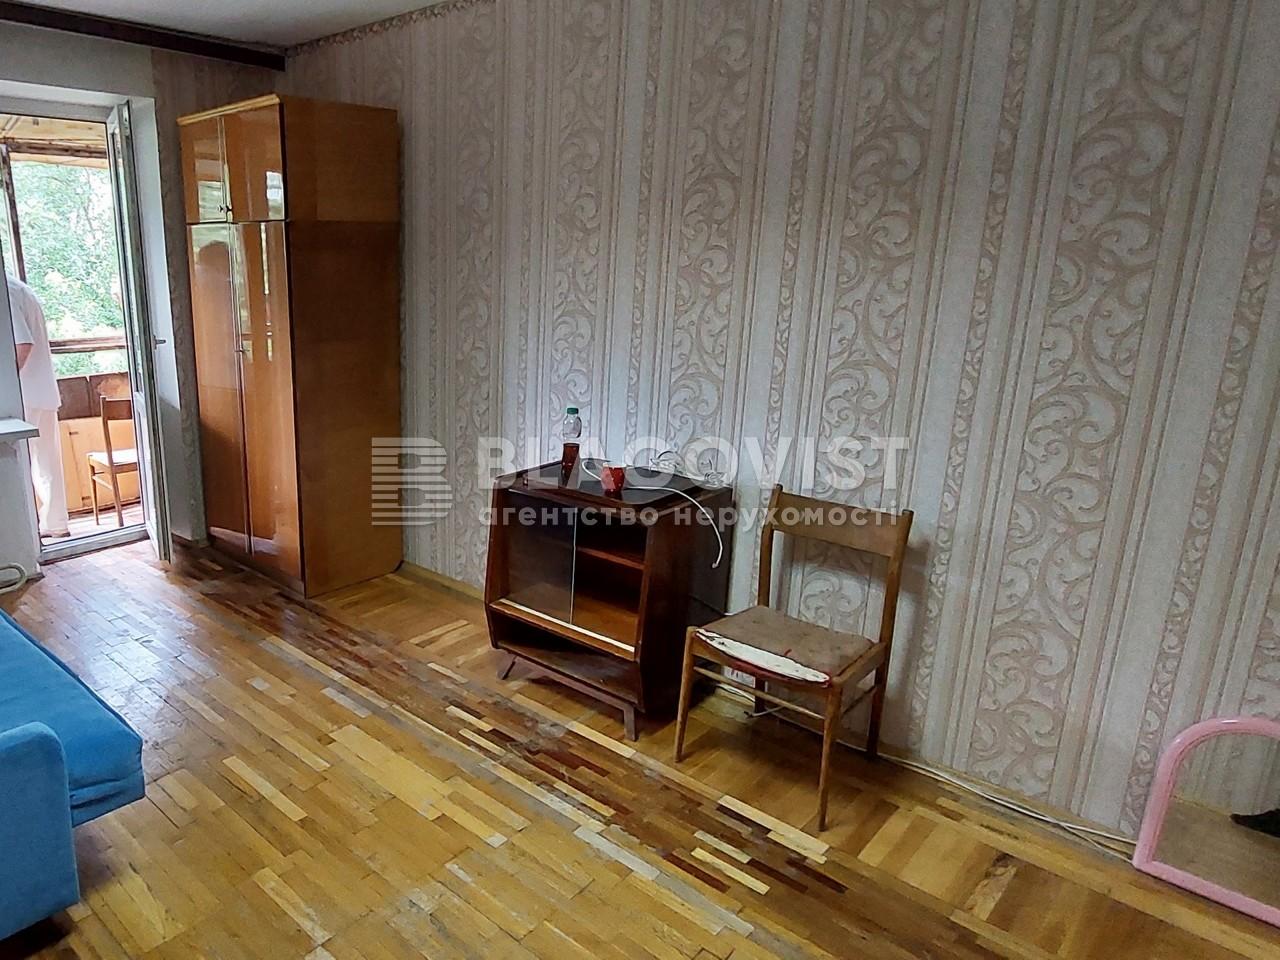 Квартира F-45386, Подвысоцкого Профессора, 8, Киев - Фото 5